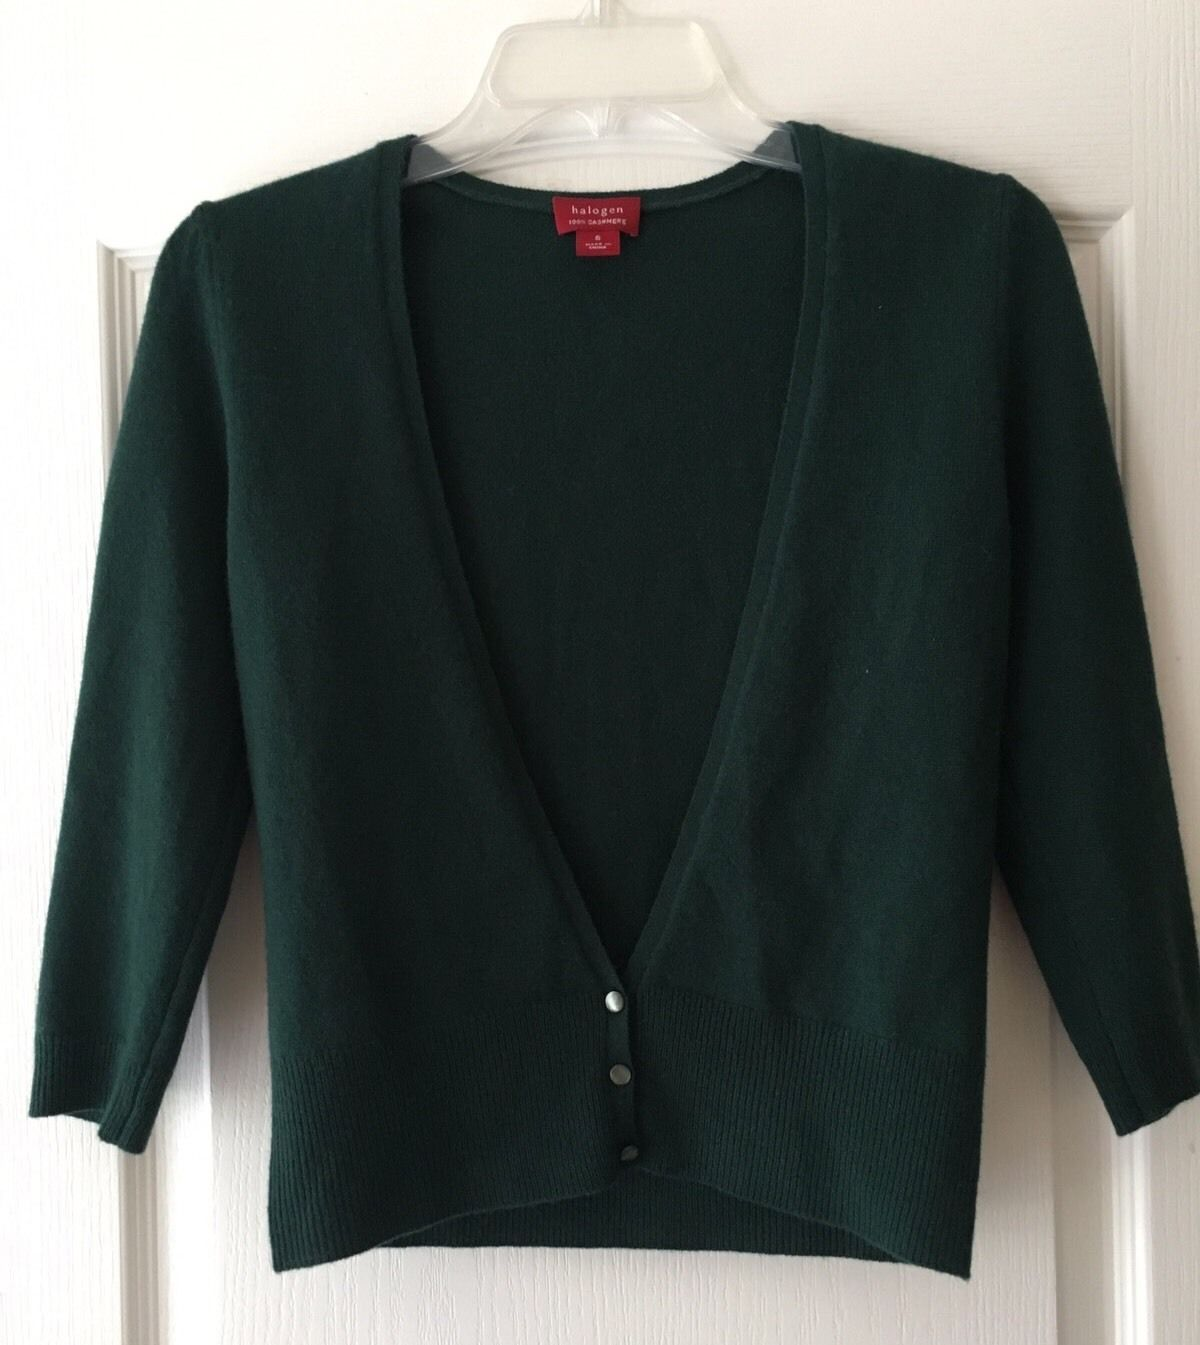 Halogen Dark Green 3/4 Sleeve Cardigan Sweater Sz S 100% Cashmere ...